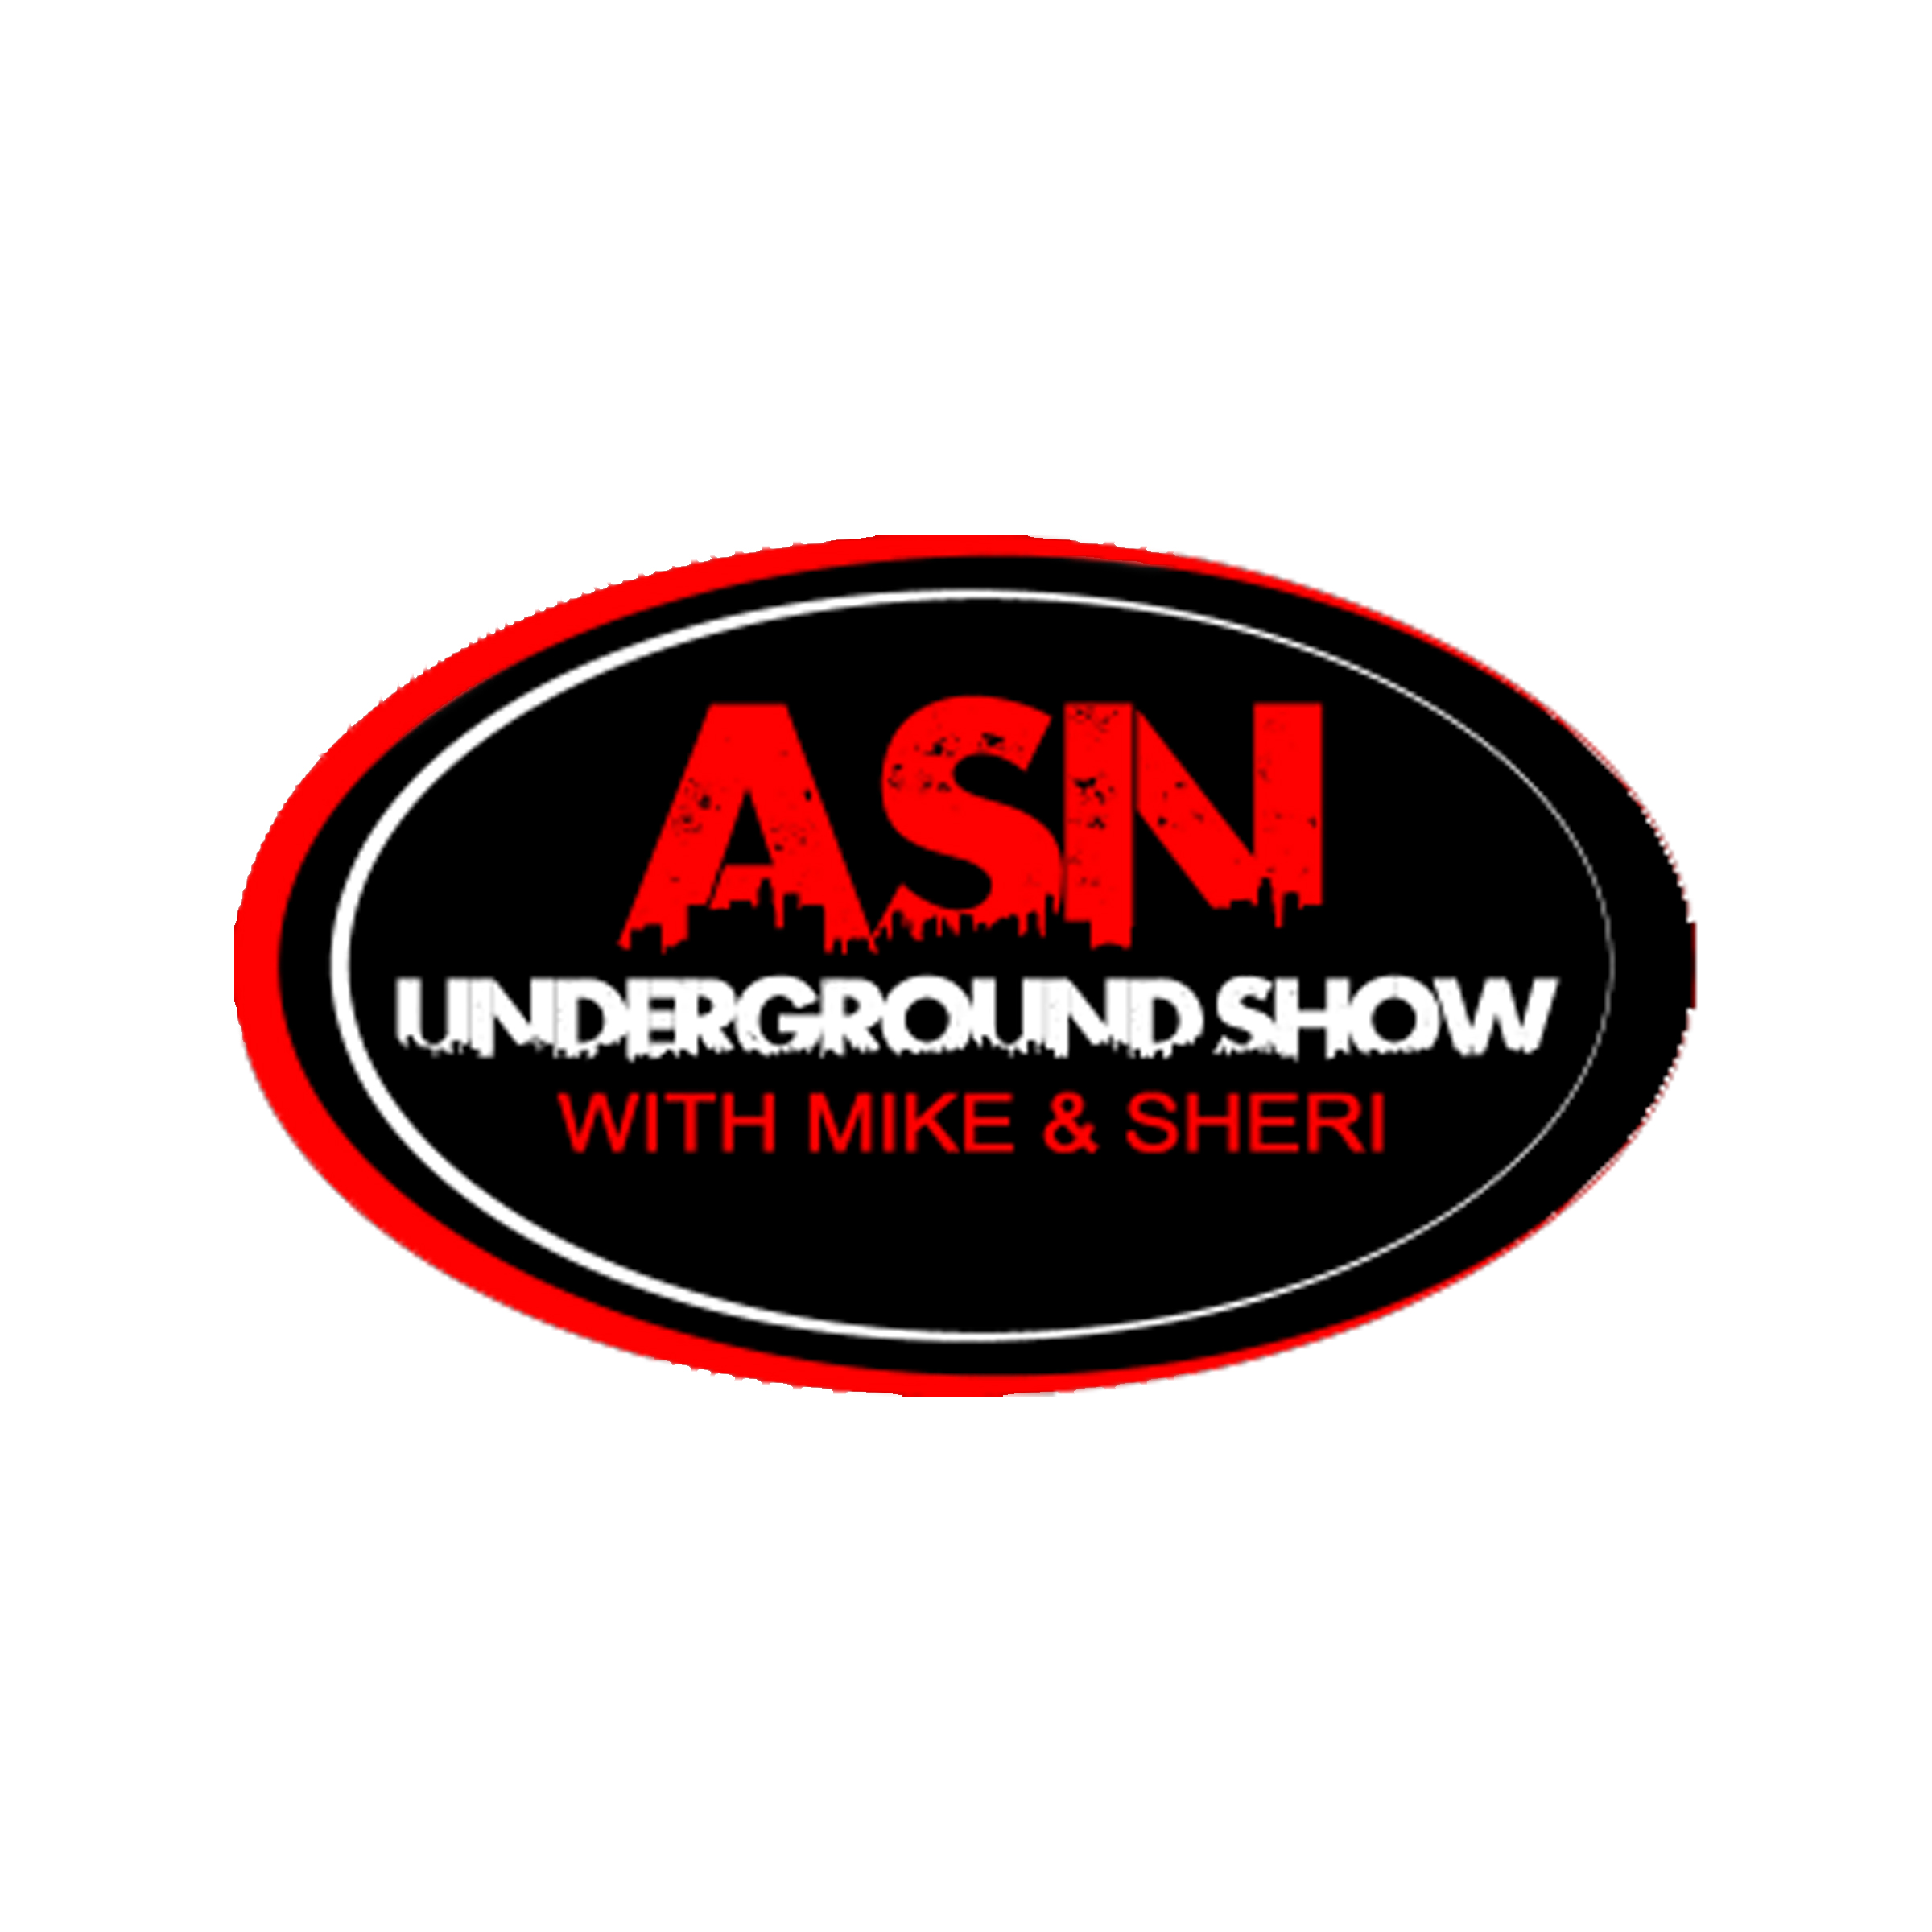 ASN Lifestyle Magazine underground show stickers 8x8